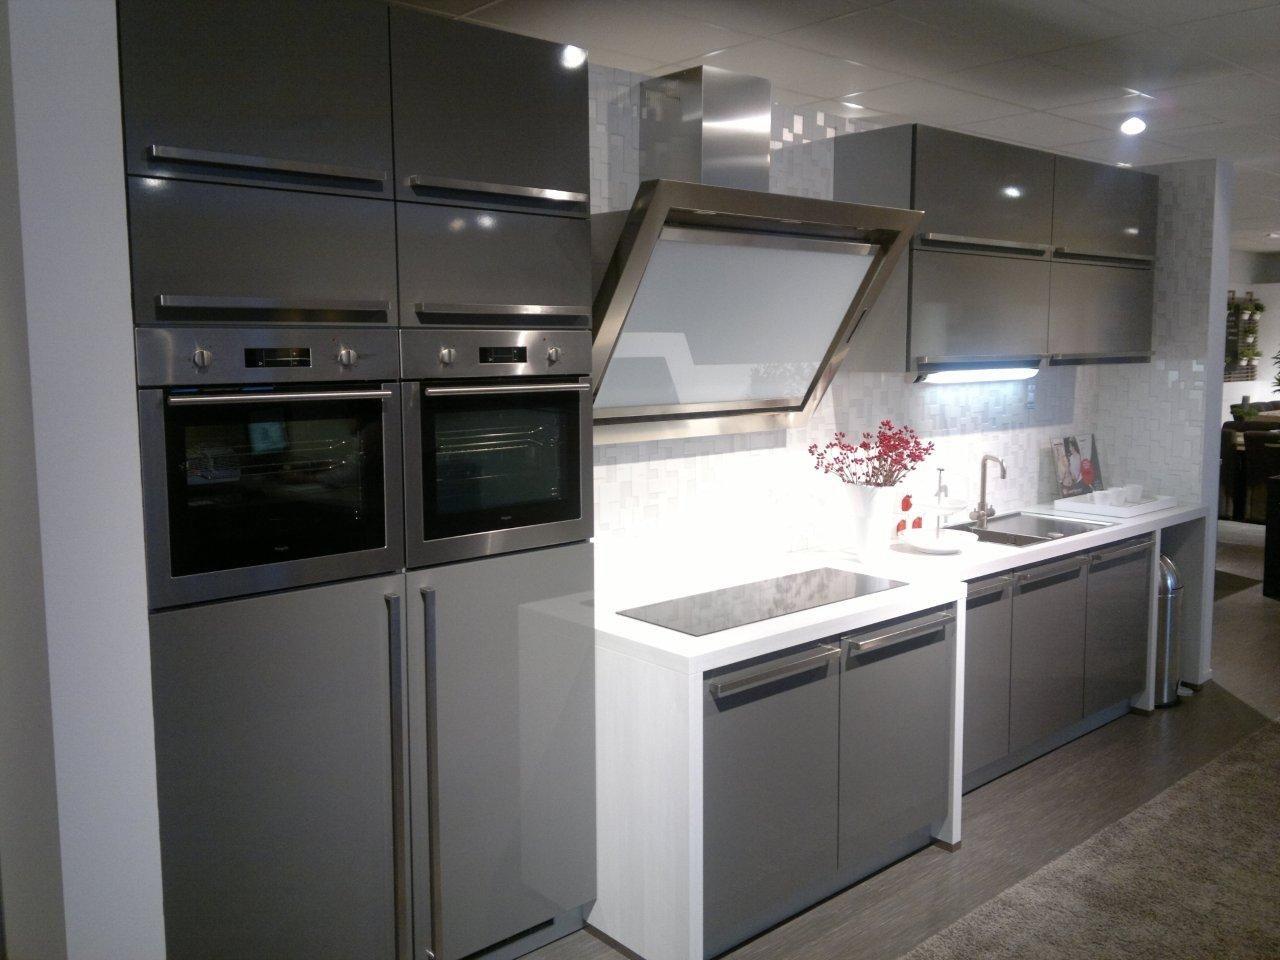 Keuken Design : moderne design keuken 45023 deze strak ogende keuken ...